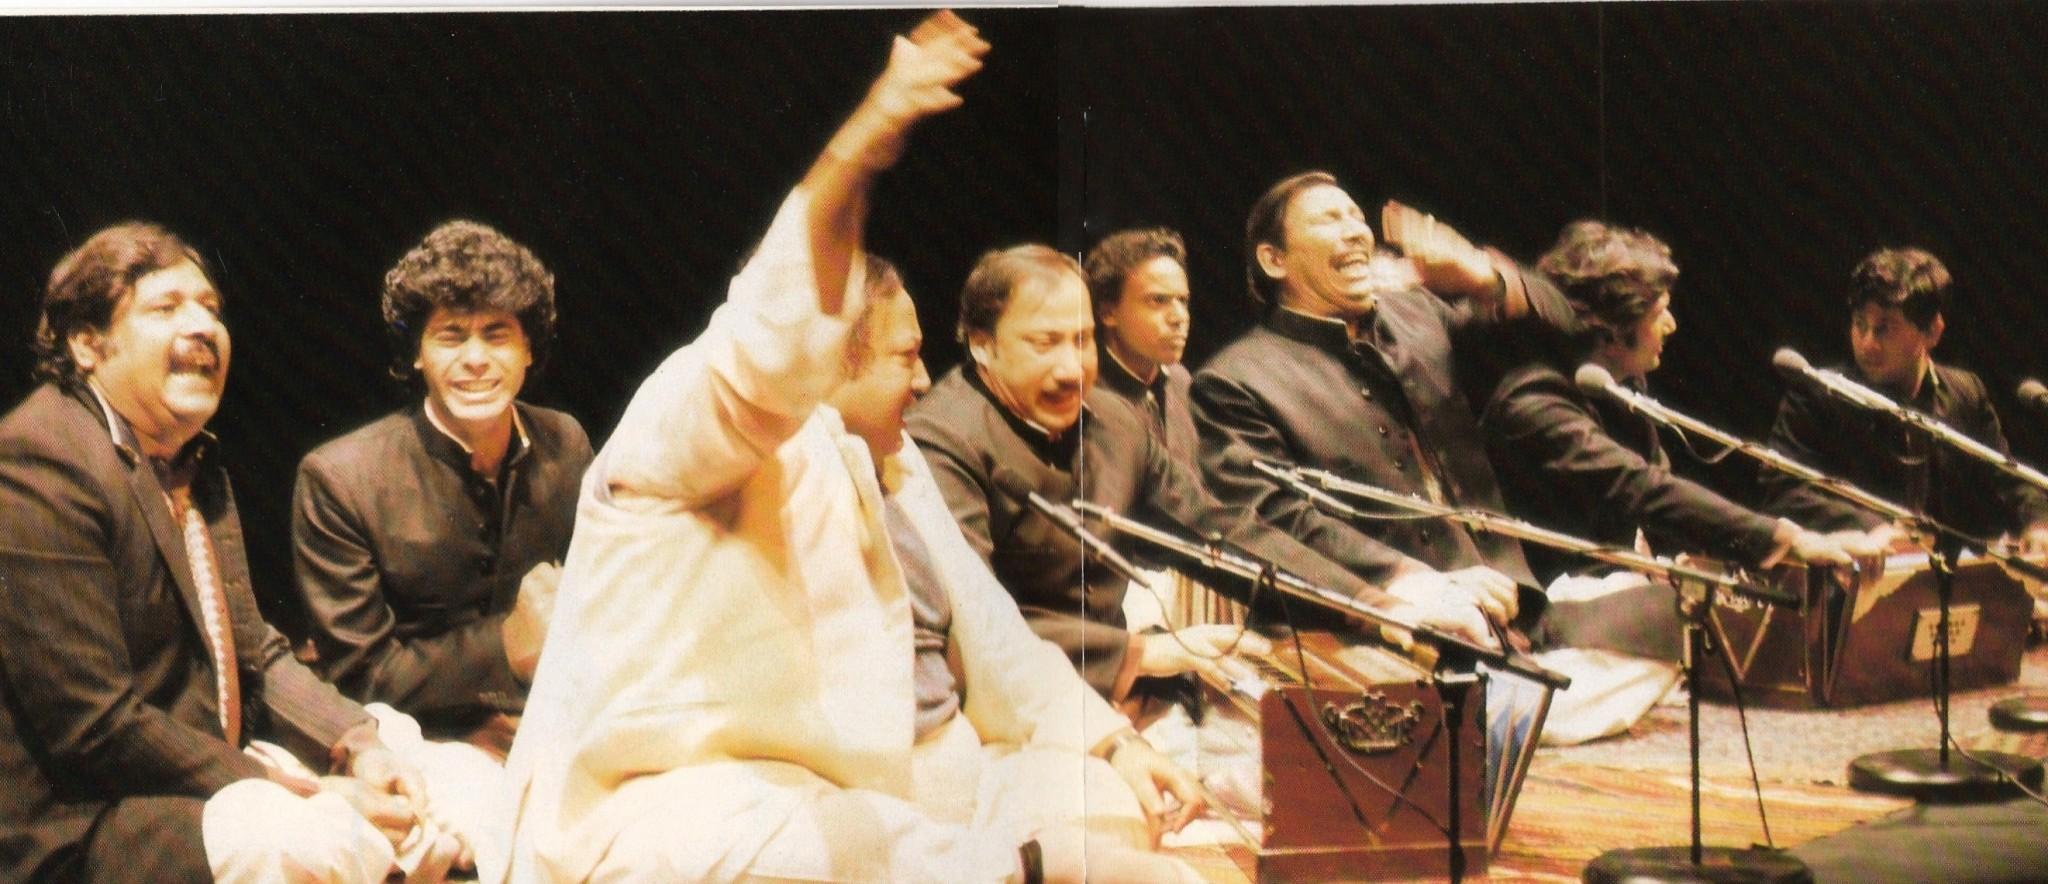 Nusrat Fateh Ali Khan - En Concert À Paris Vol. 2